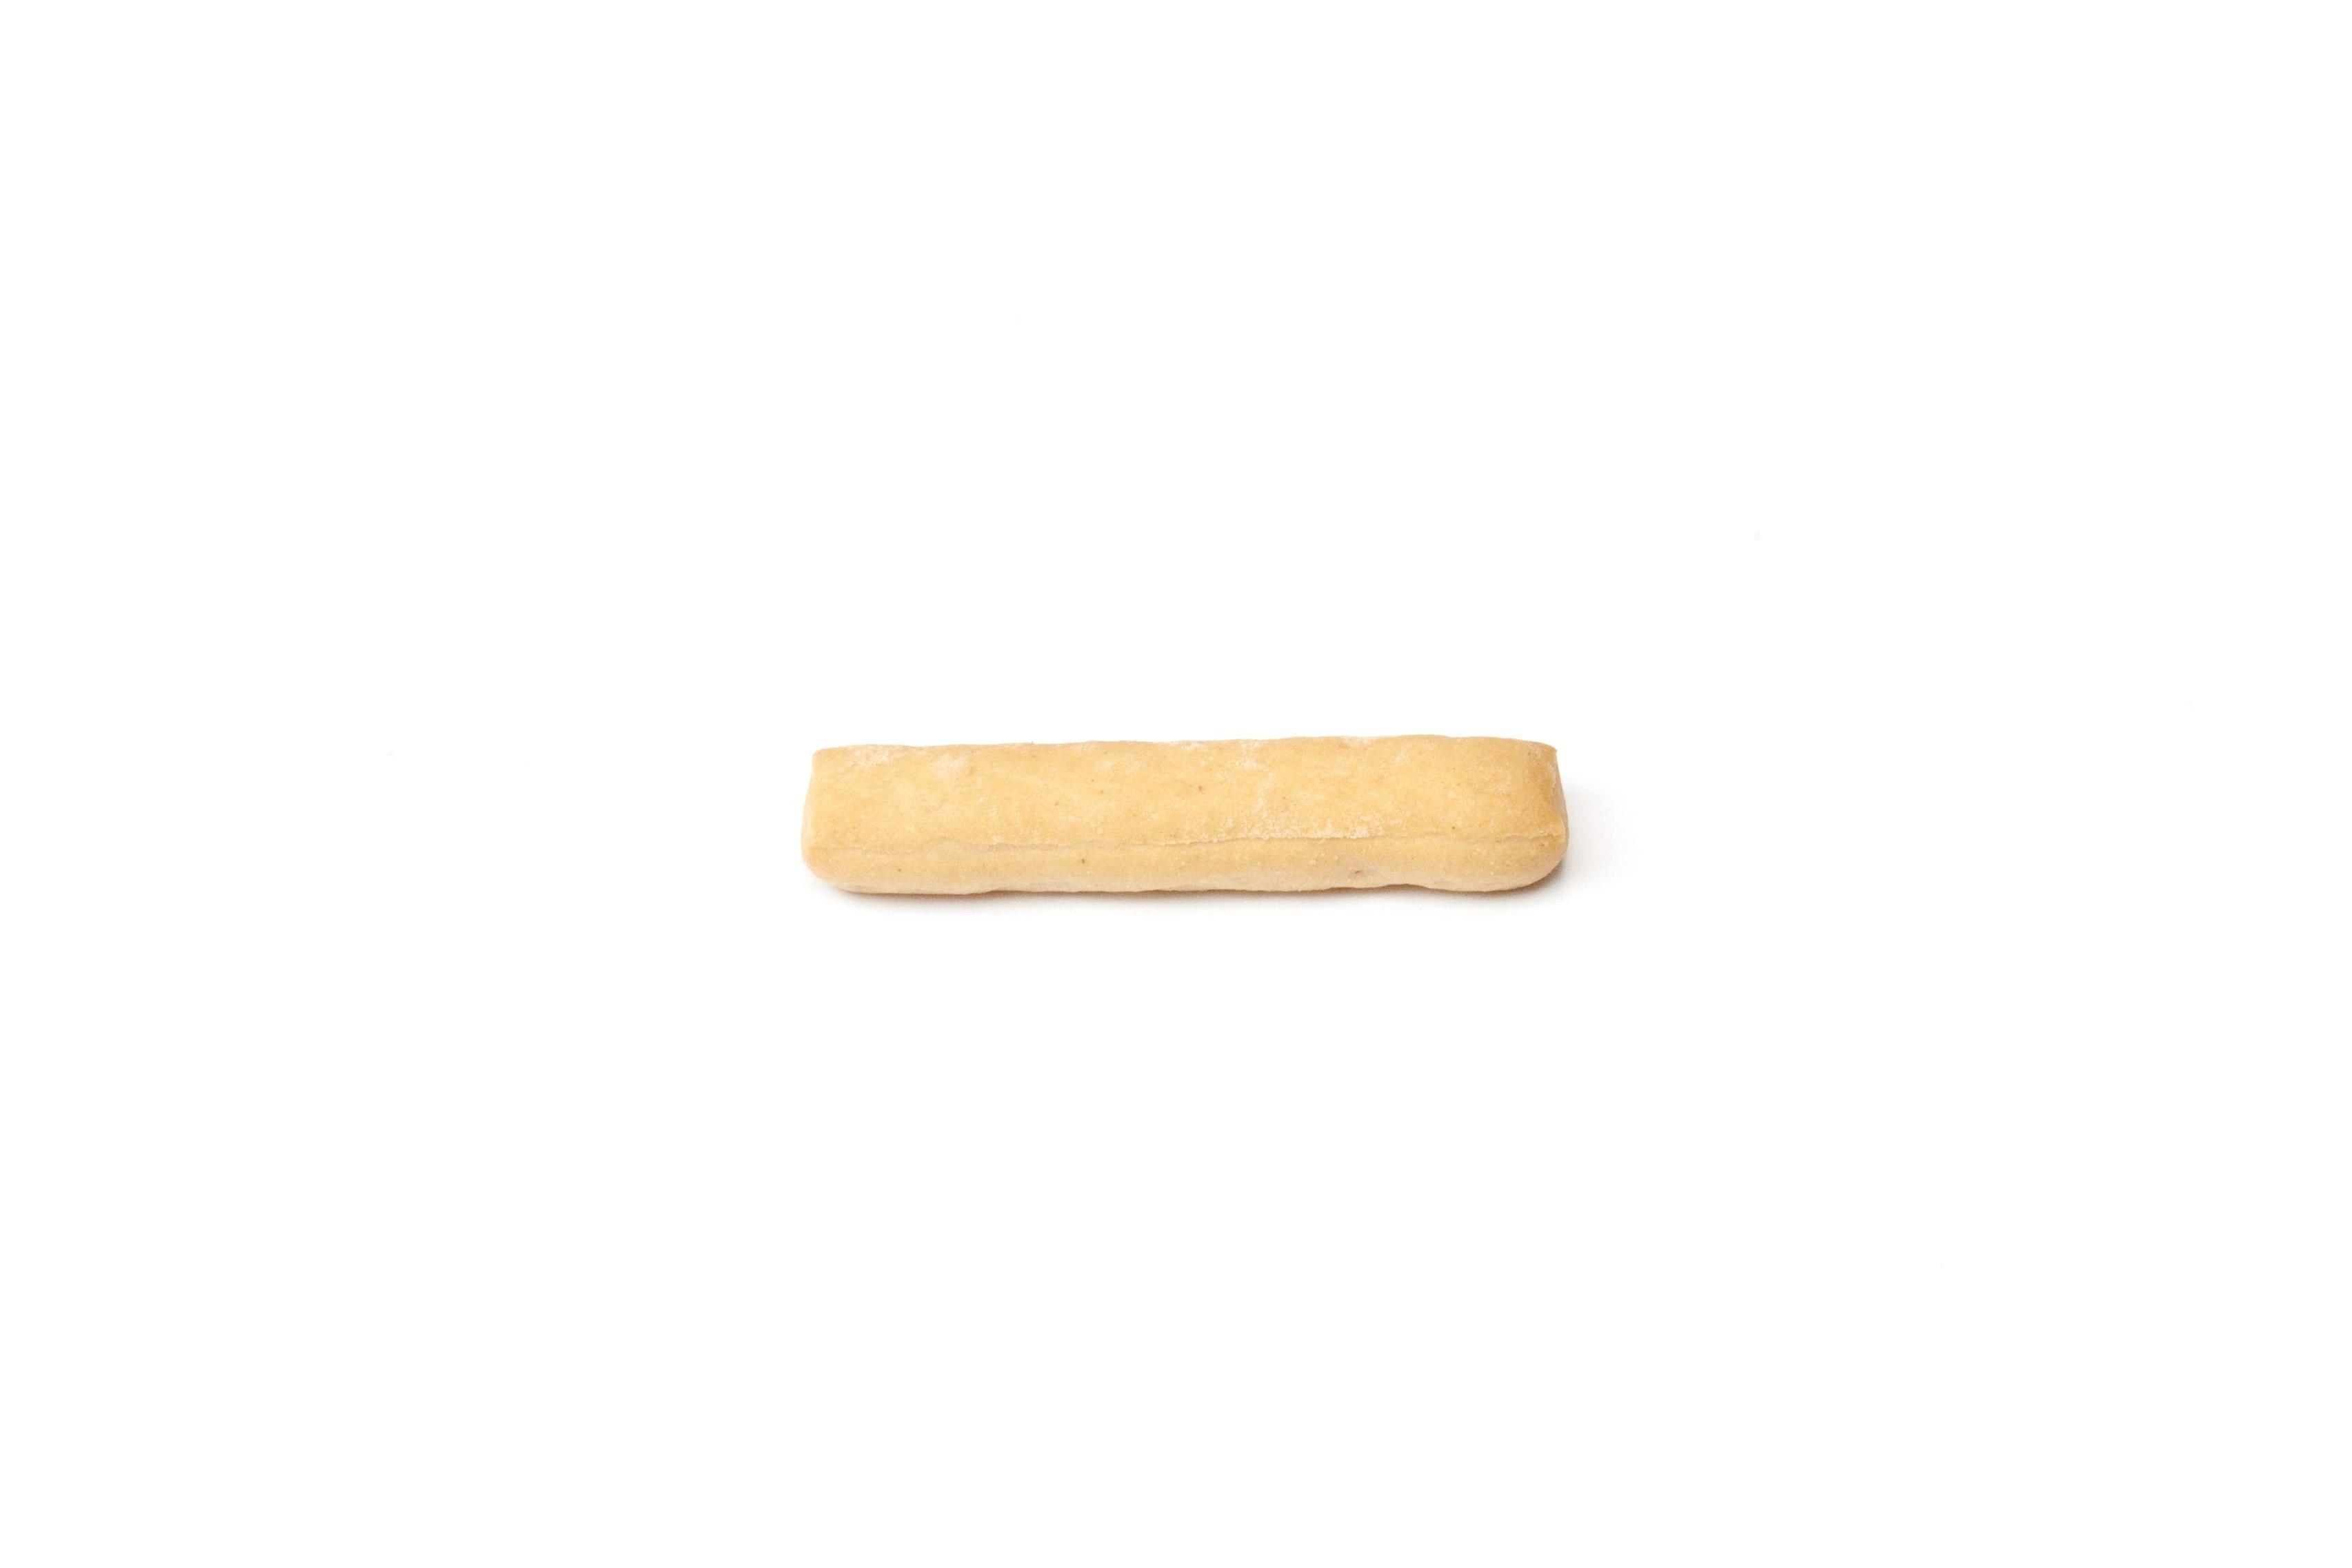 Mini Grissini breadsticks Apero 6.5cm Natural 1kg DV Foods